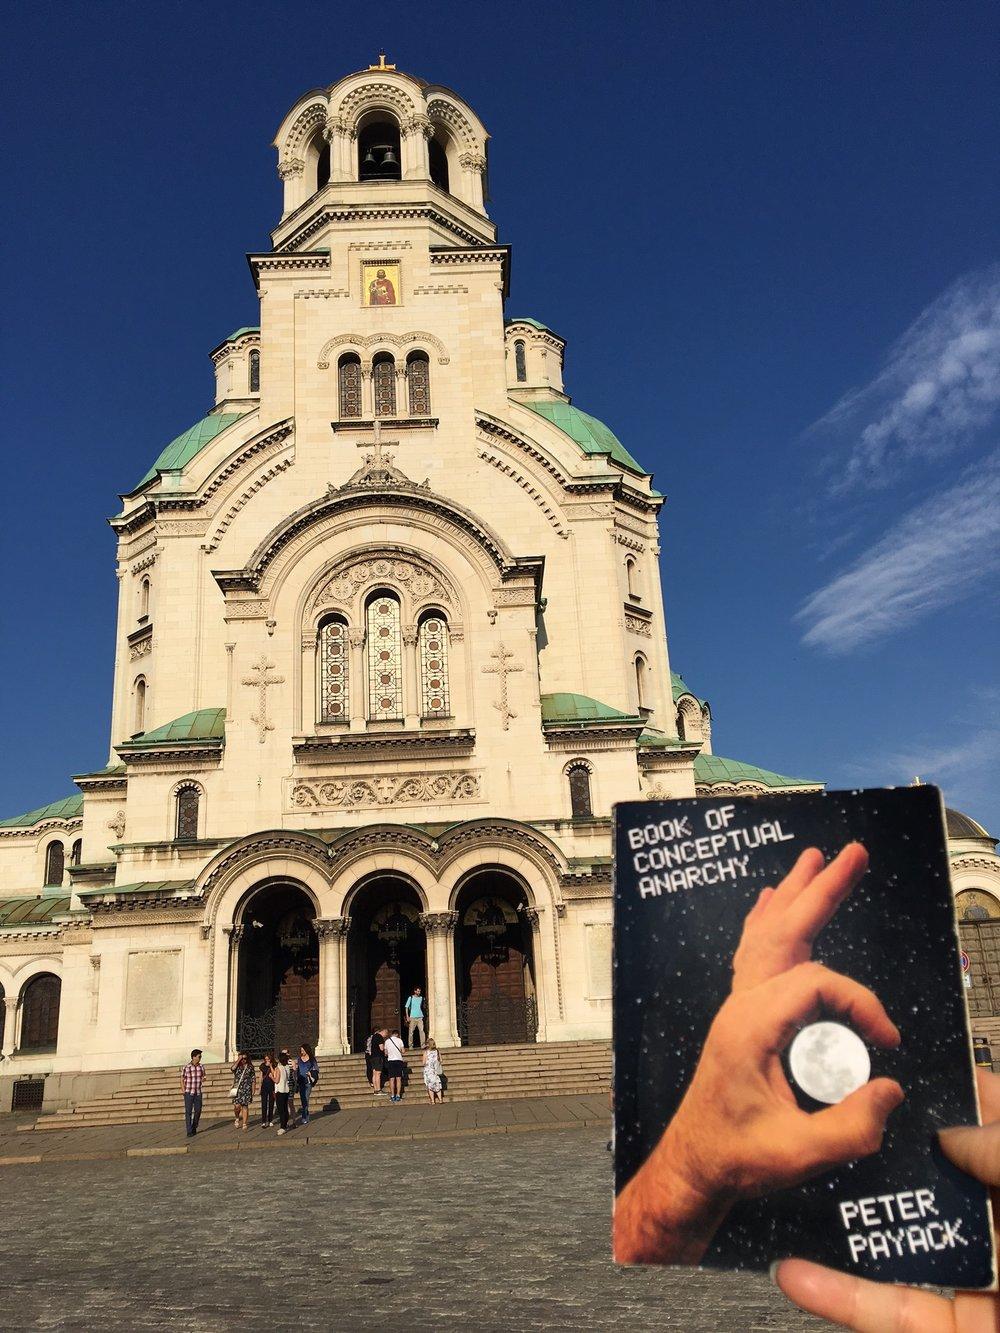 Alexander Nevsky Cathedral, Sophia, Bulgaria